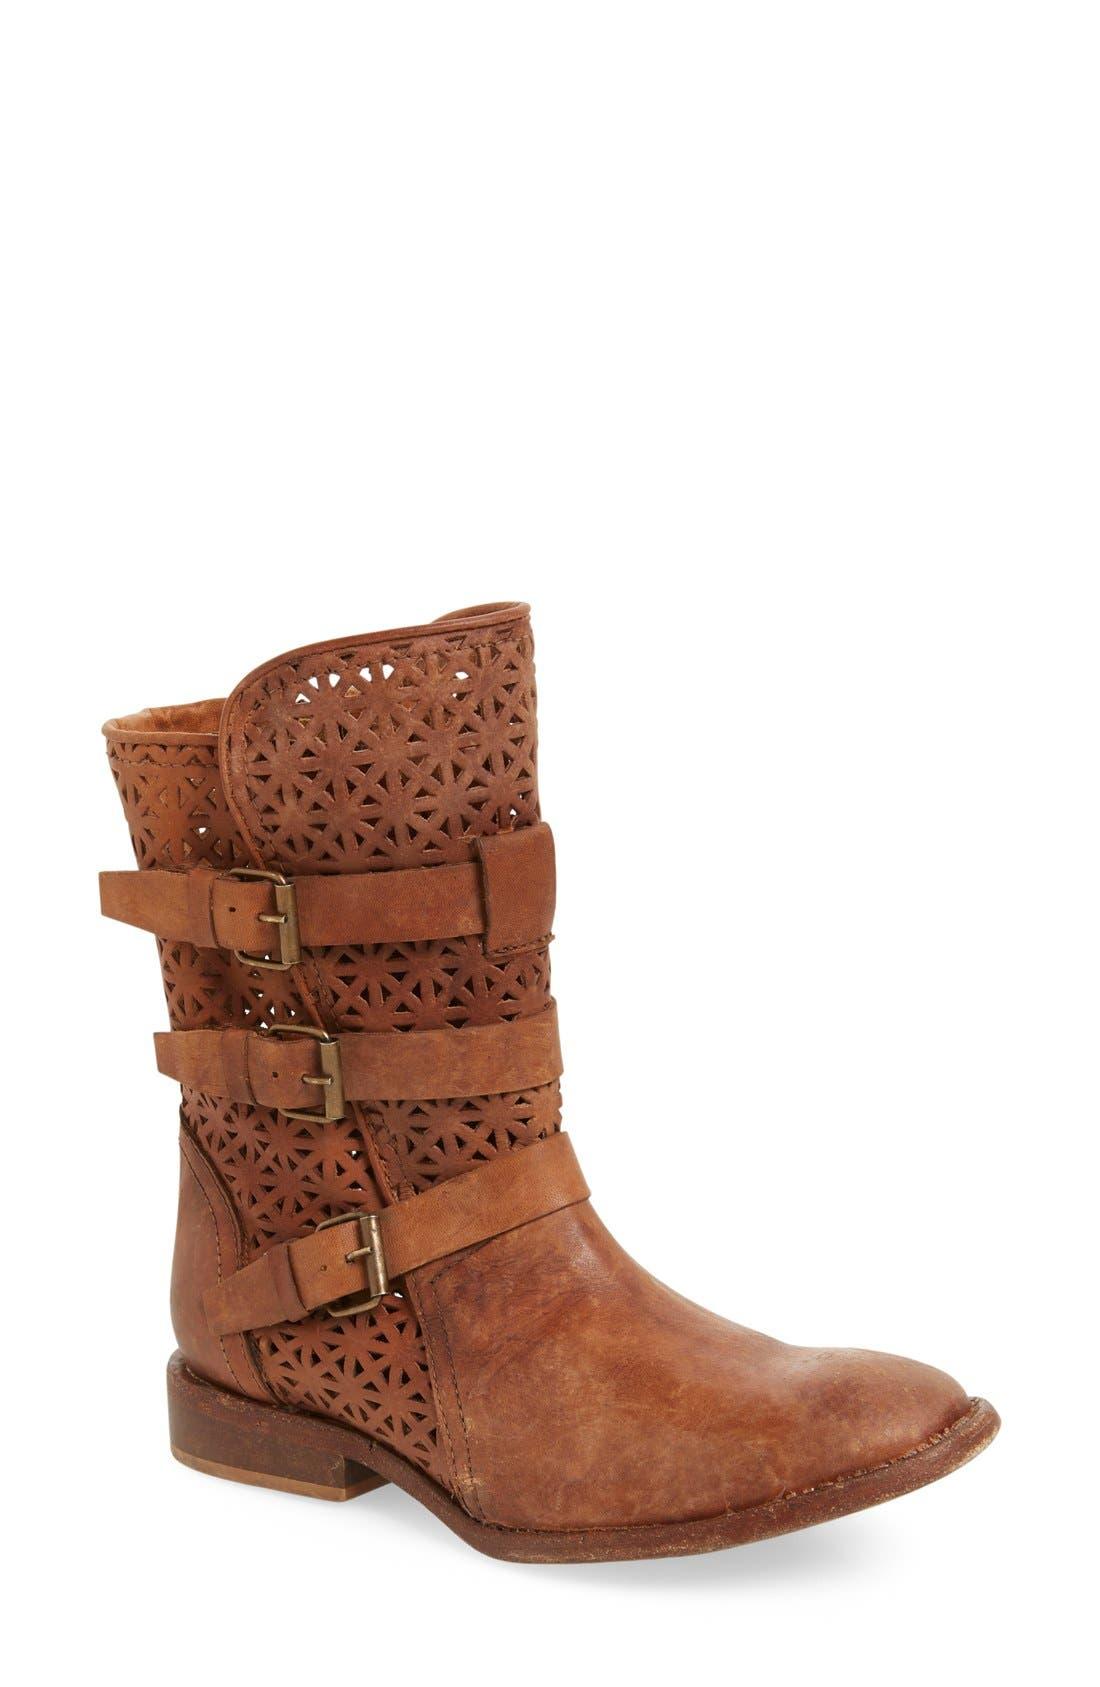 Alternate Image 1 Selected - Matisse 'National' Perforated Moto Boot (Women)